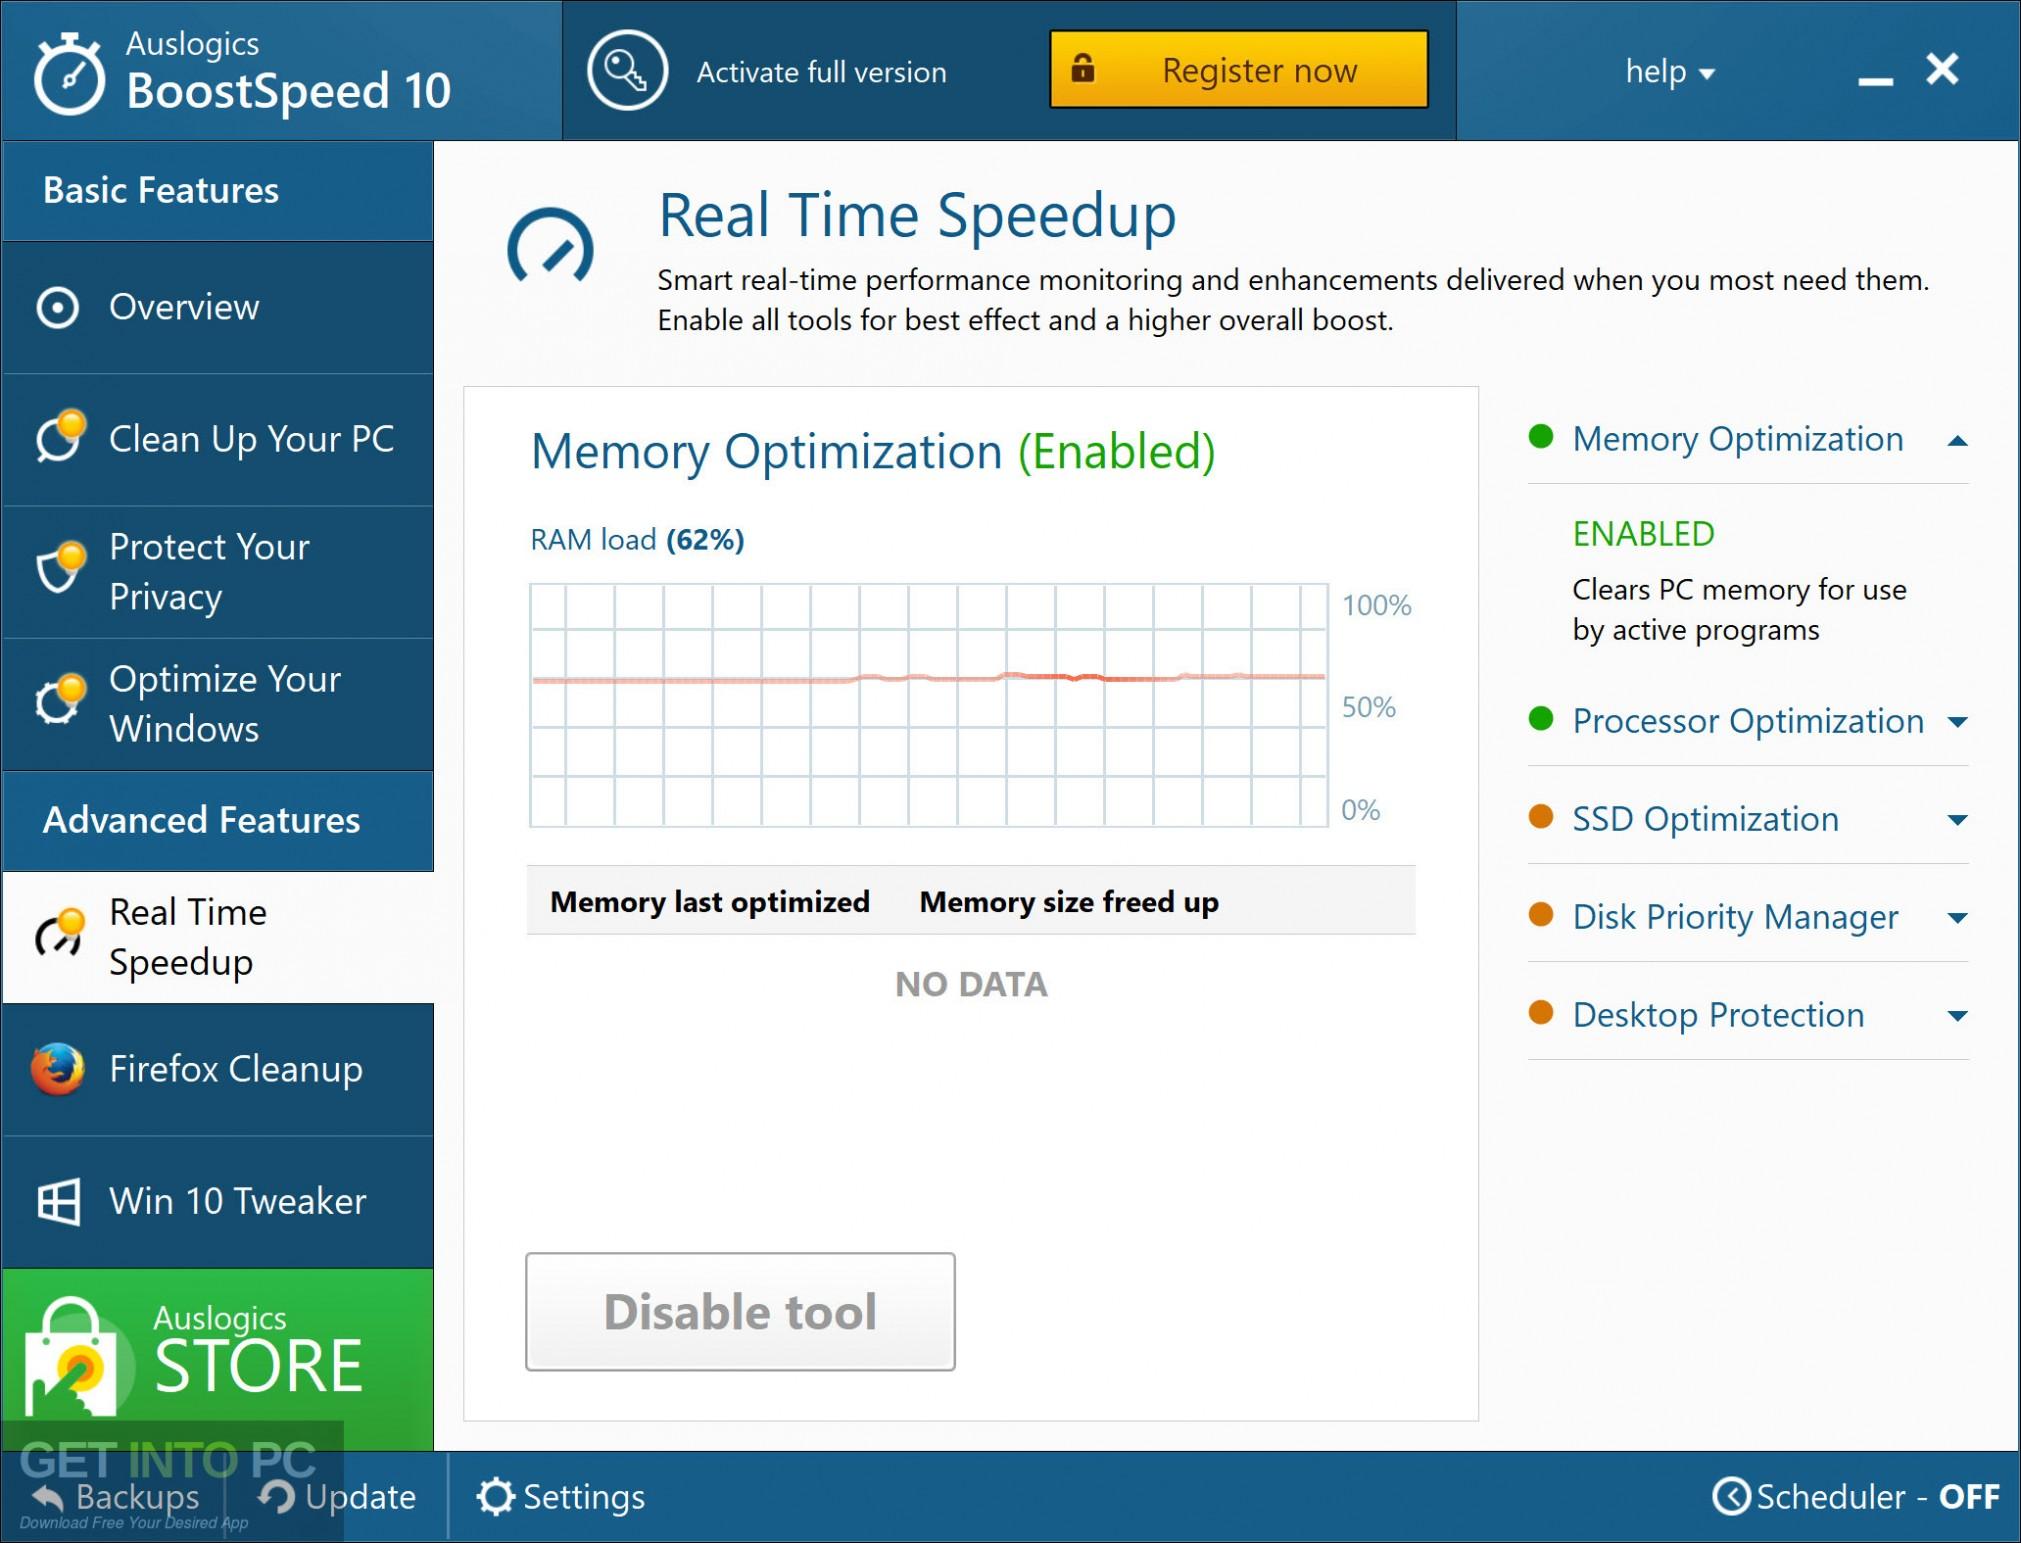 Auslogics BoostSpeed 2020 Direct Link Download